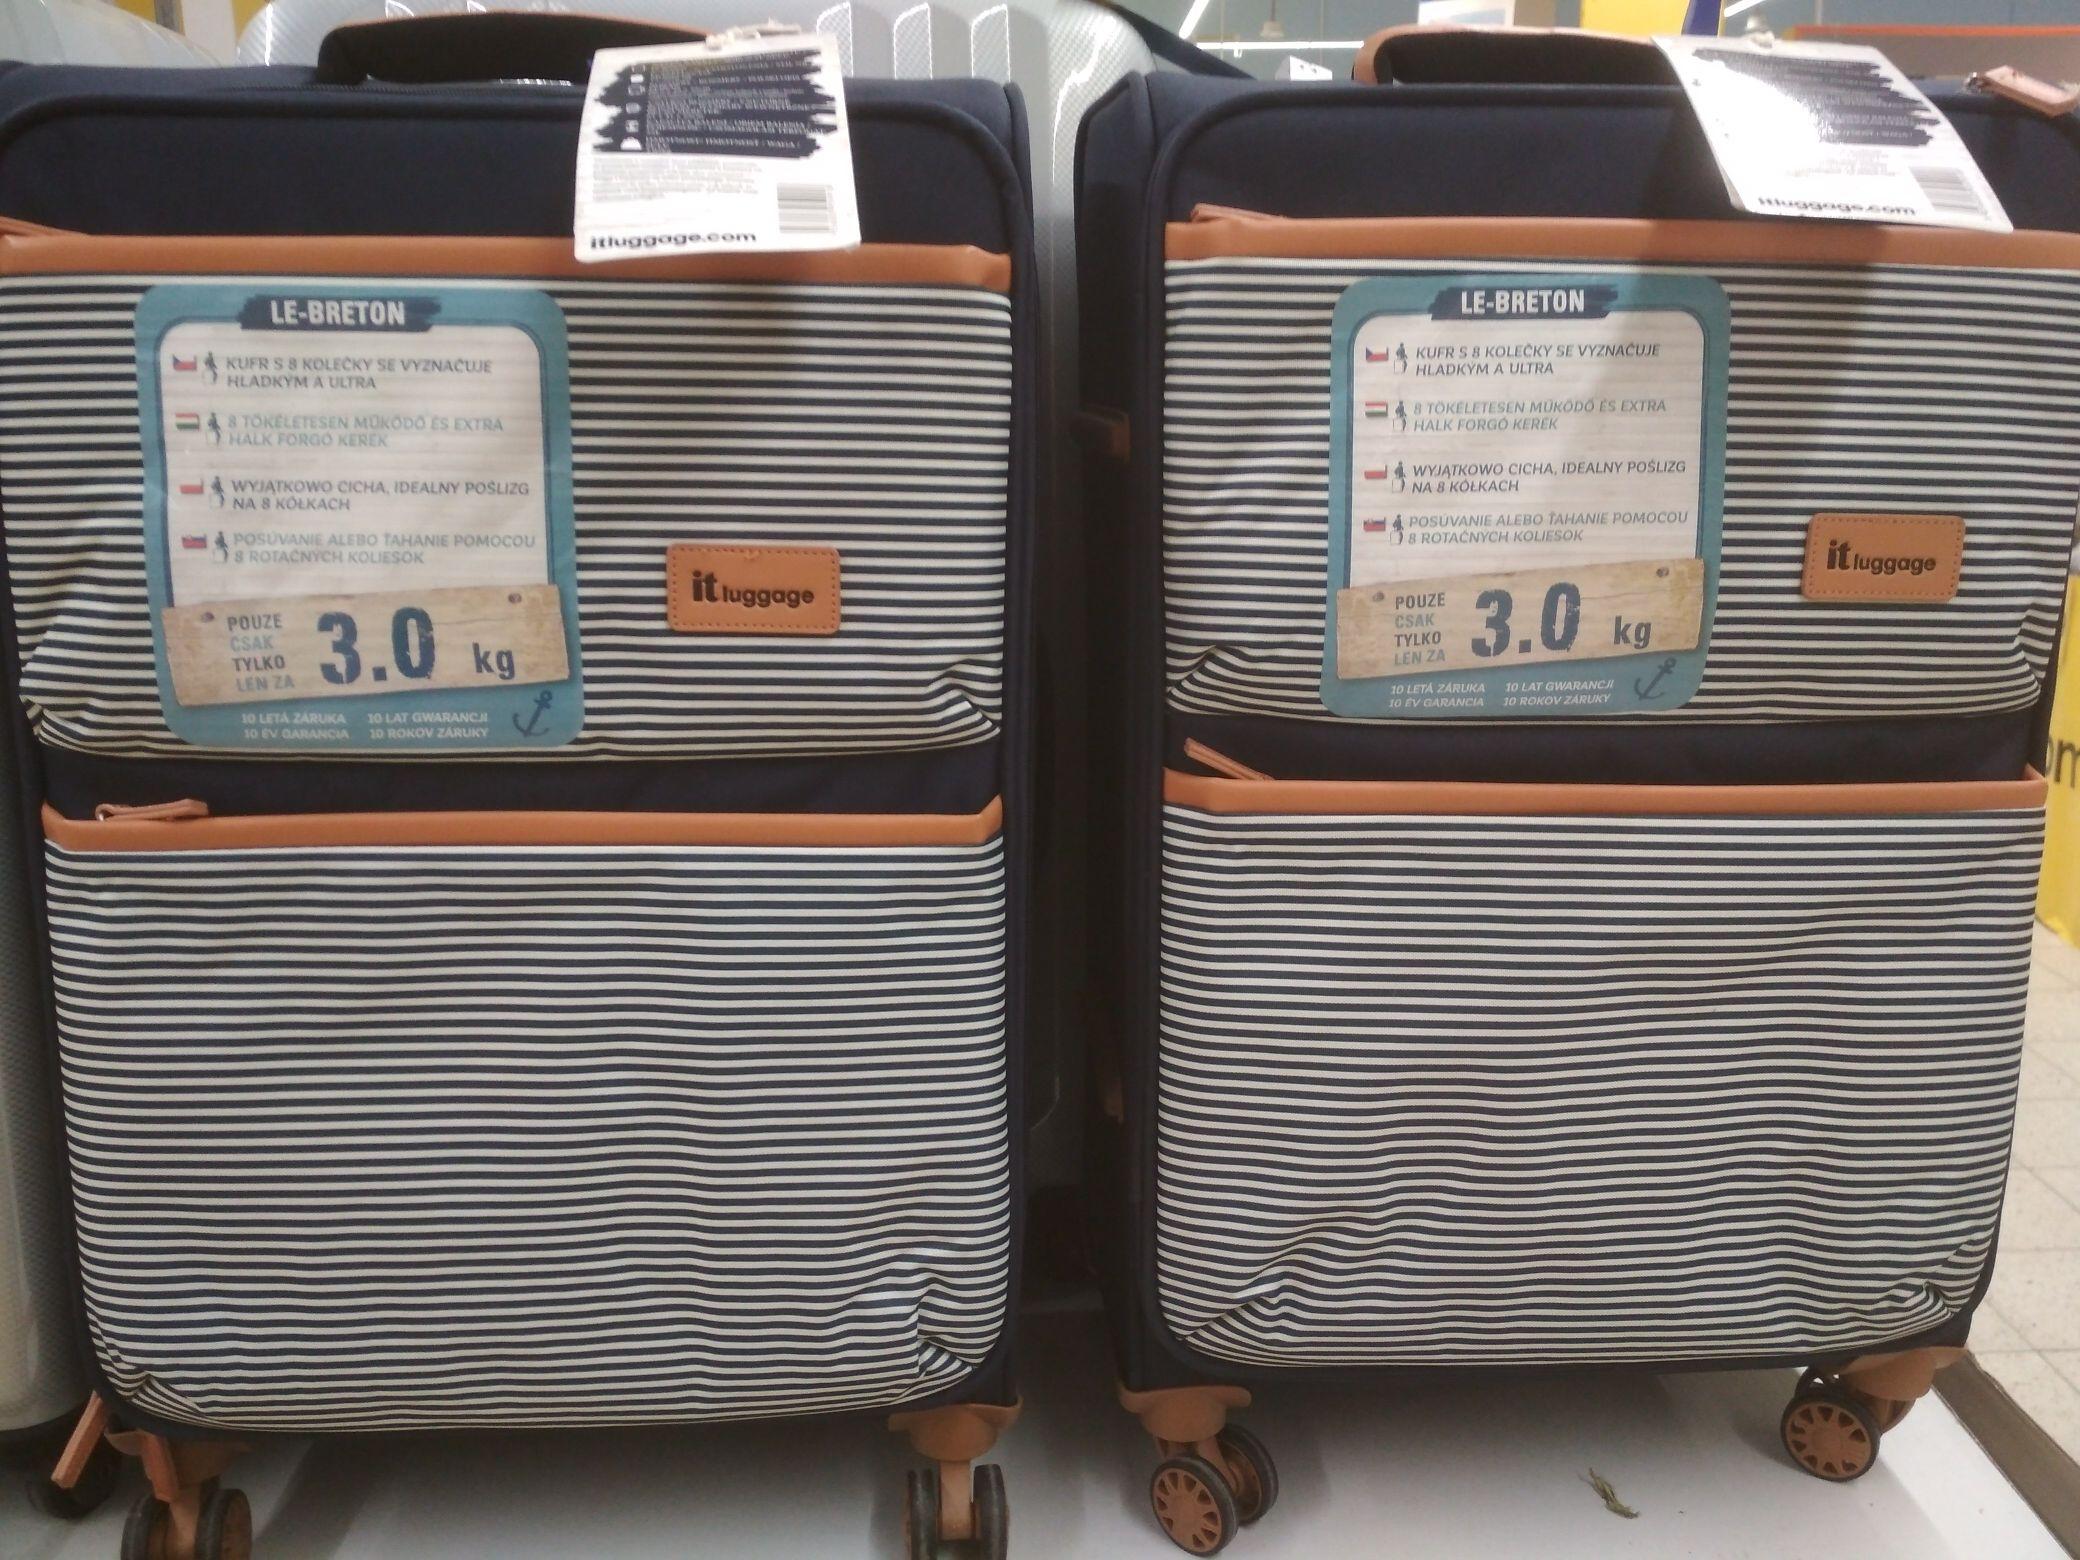 Walizka it luggage, 55 L, 10 lat gwarancji.